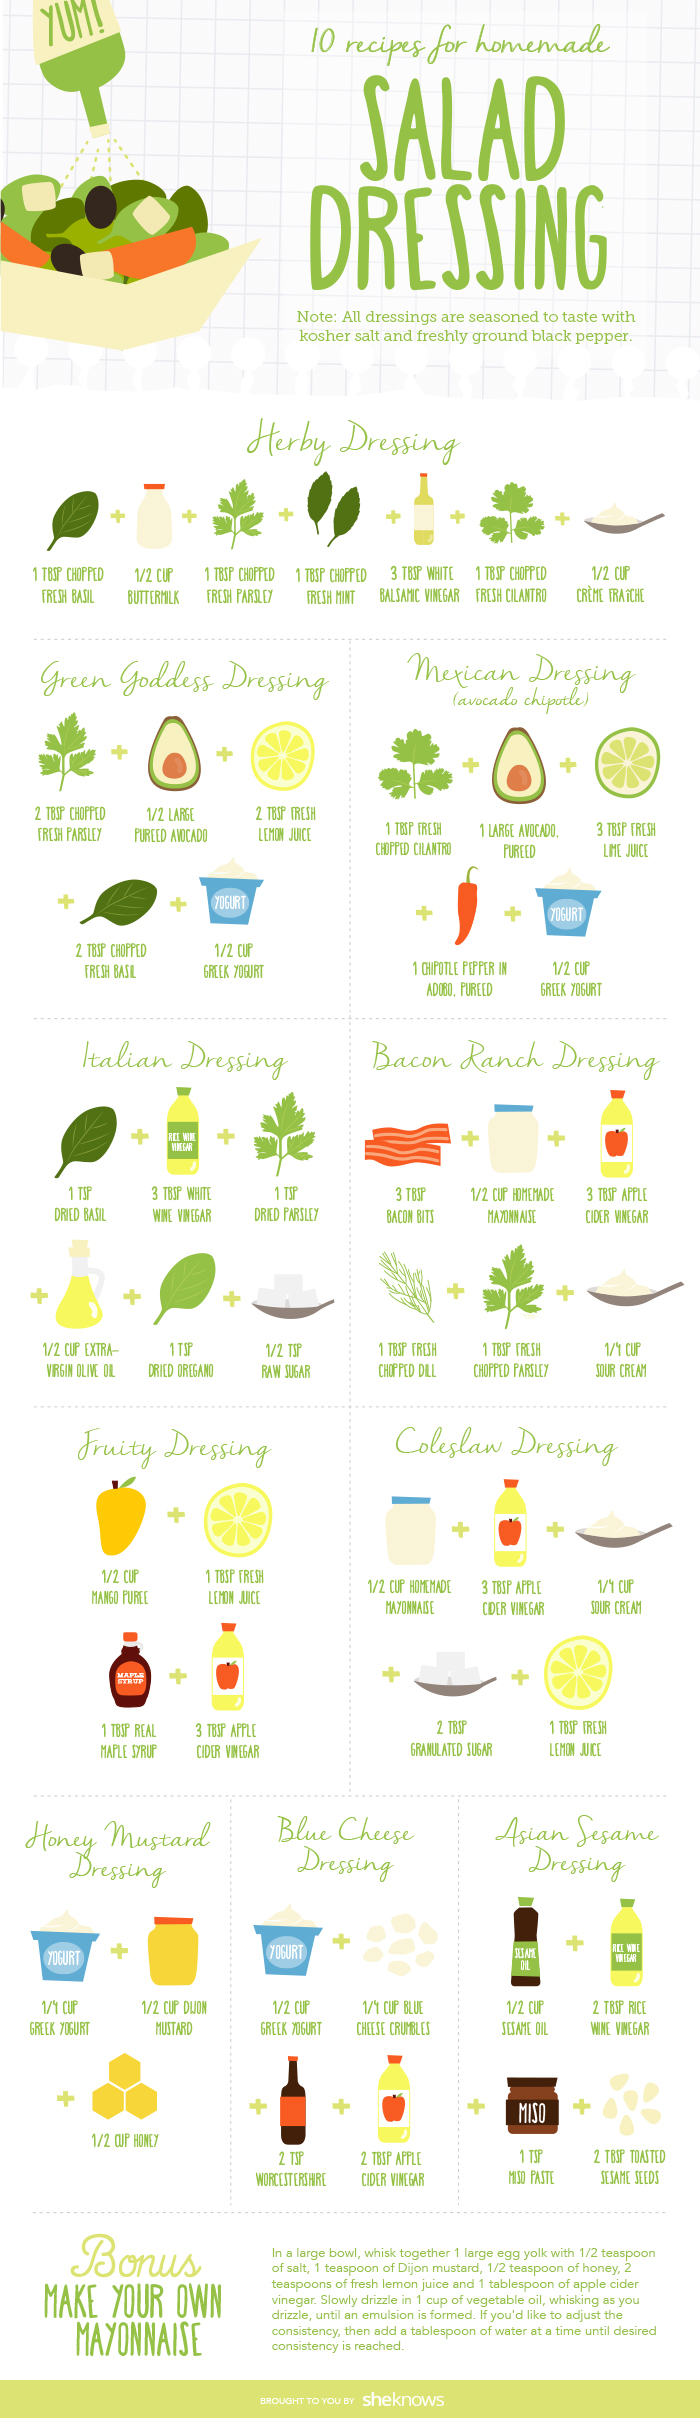 easy homemade salad dressing recipes infographic